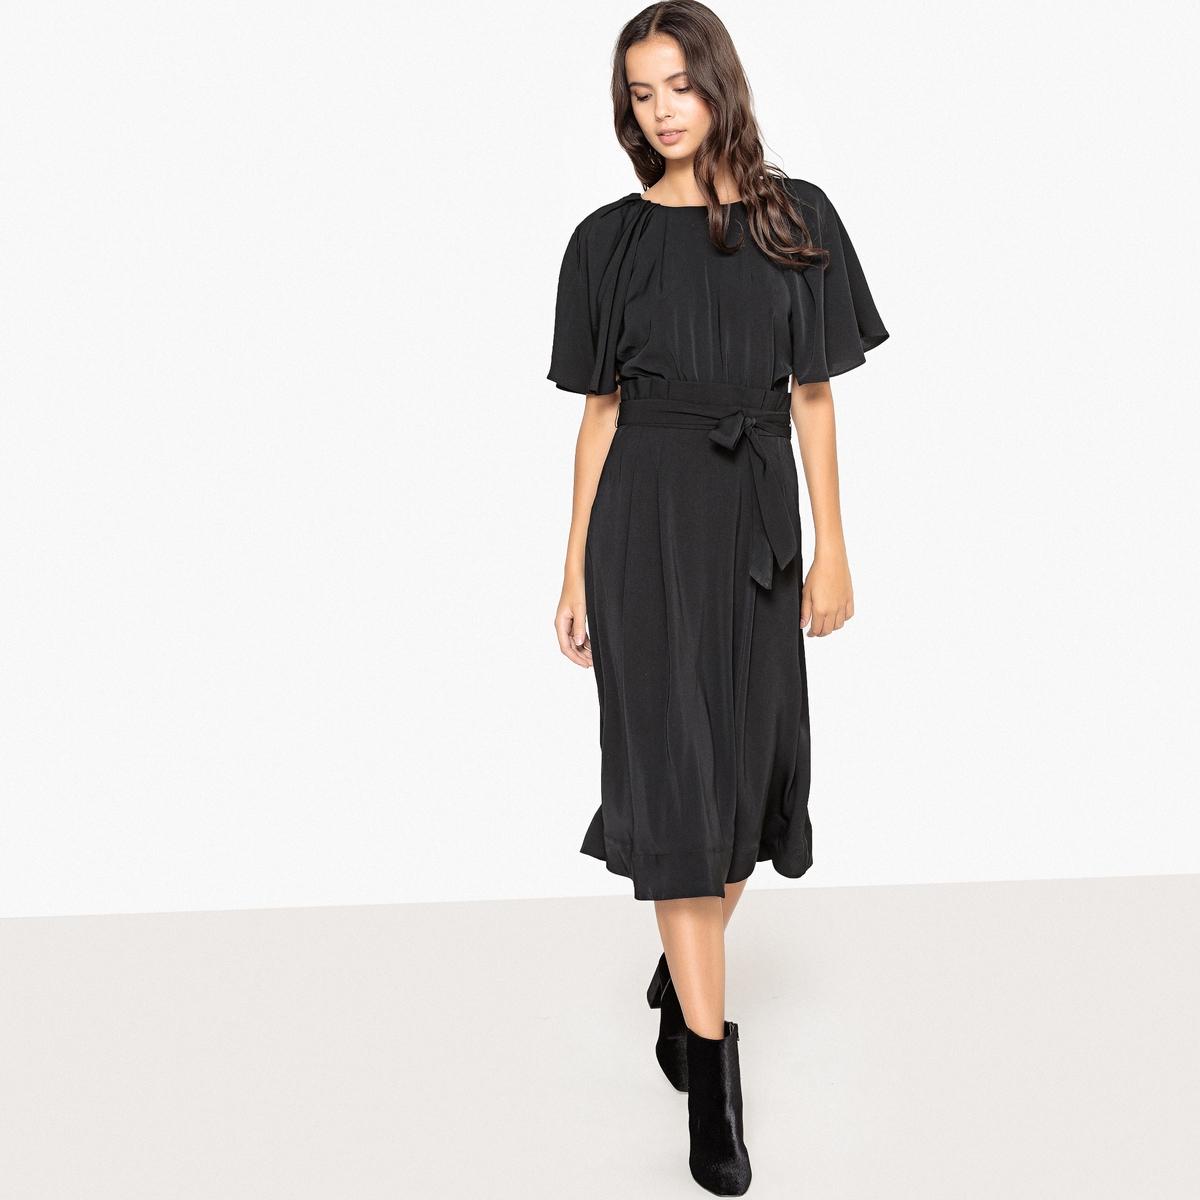 Коктейльное платье La Redoute Collections 15522335 от LaRedoute